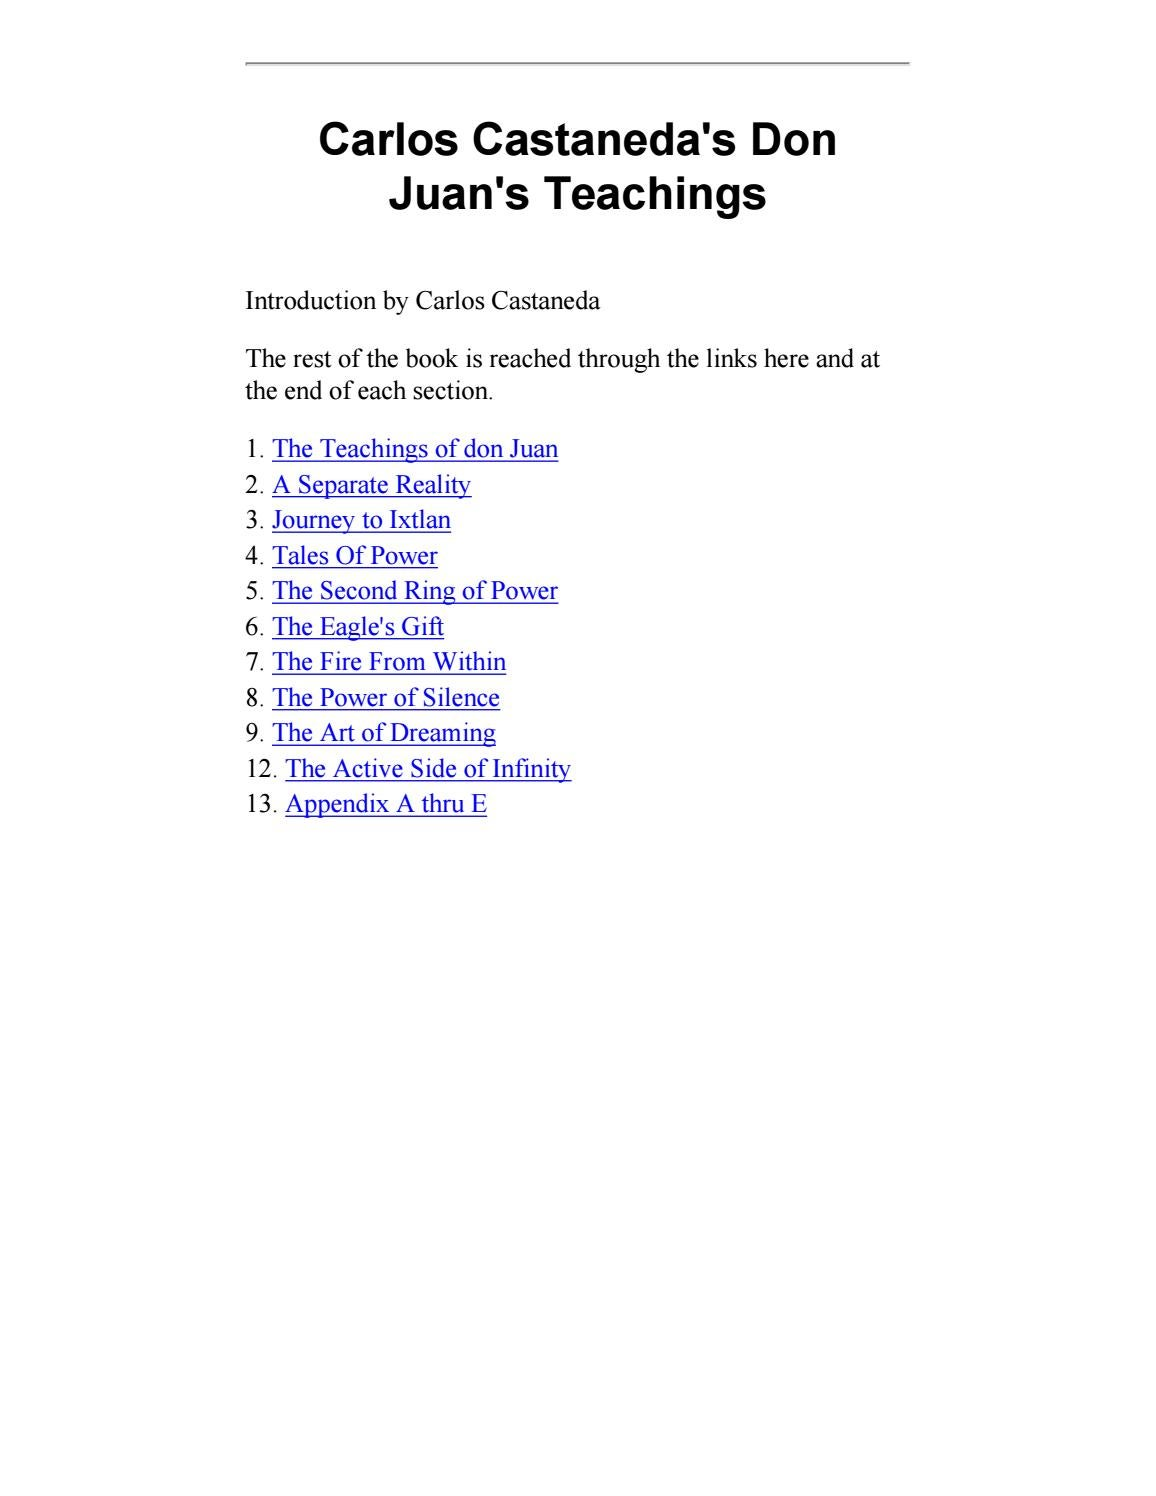 The Teachings of Don Juan Carlos Castaneda Women/'s T shirt American Apparel